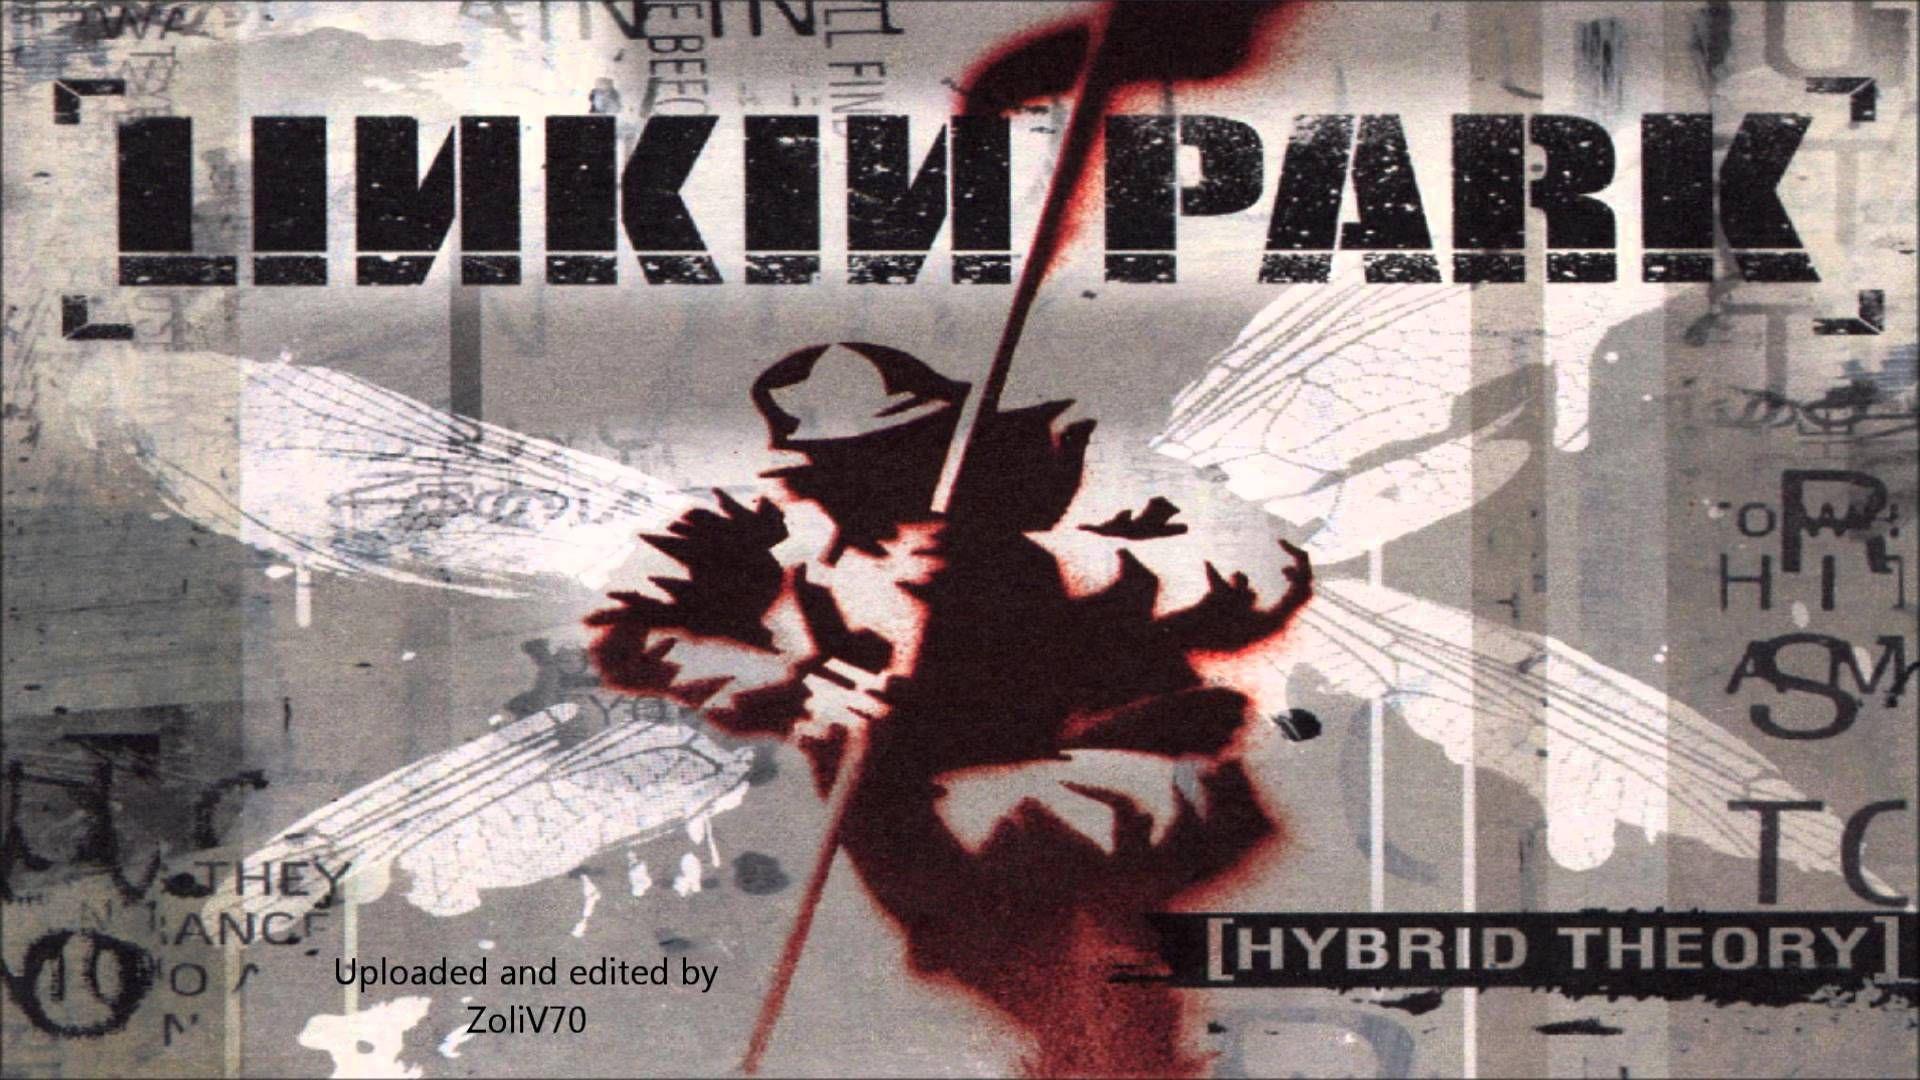 Linkin Park - My December [With Lyrics] [Full HD 1080p], via